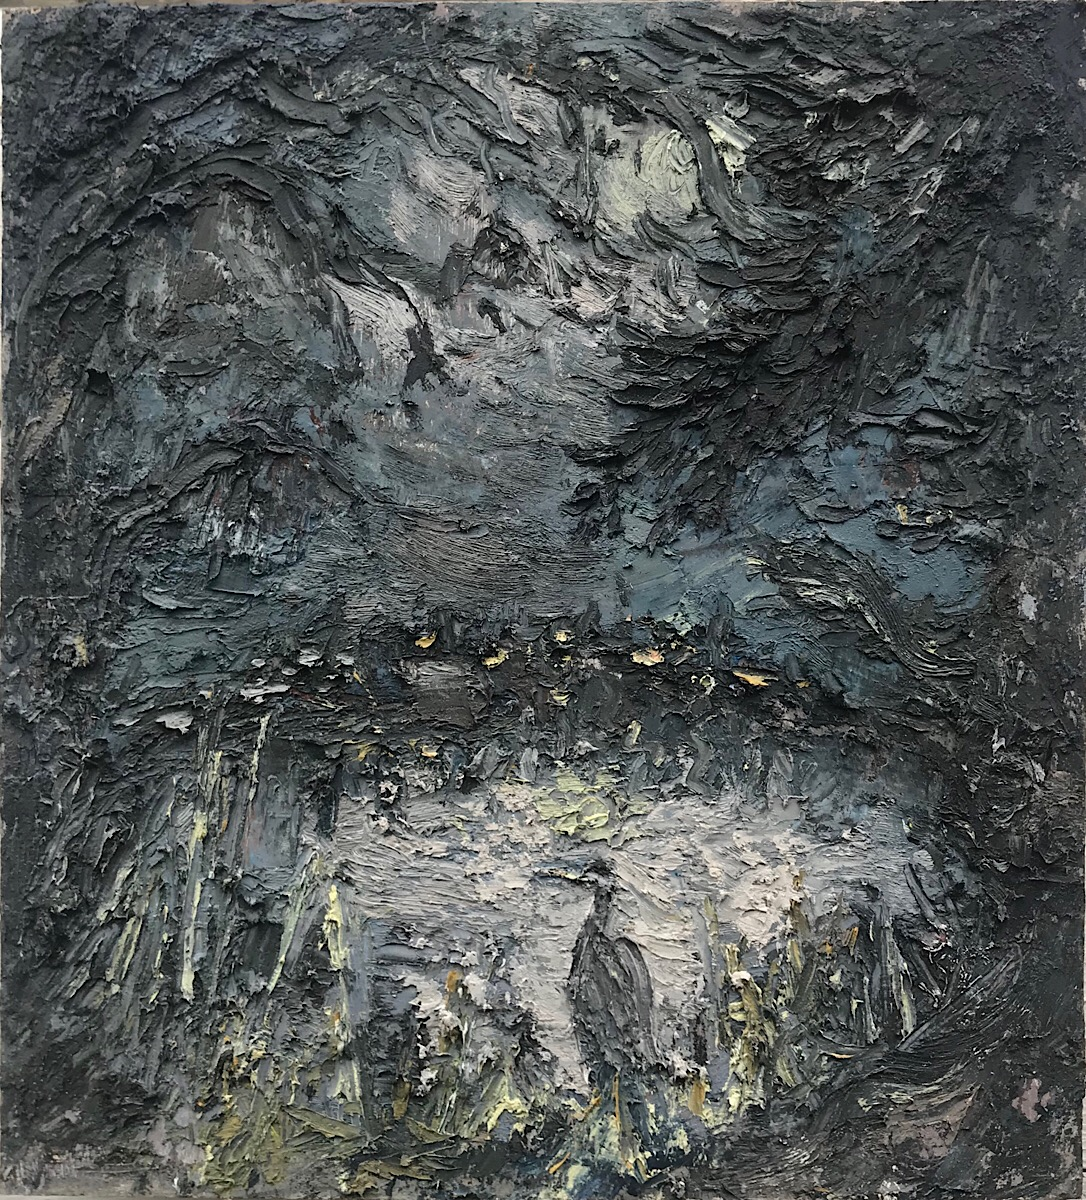 Heron in the Moonlight, oil on panel, 13x 12 in., 2019